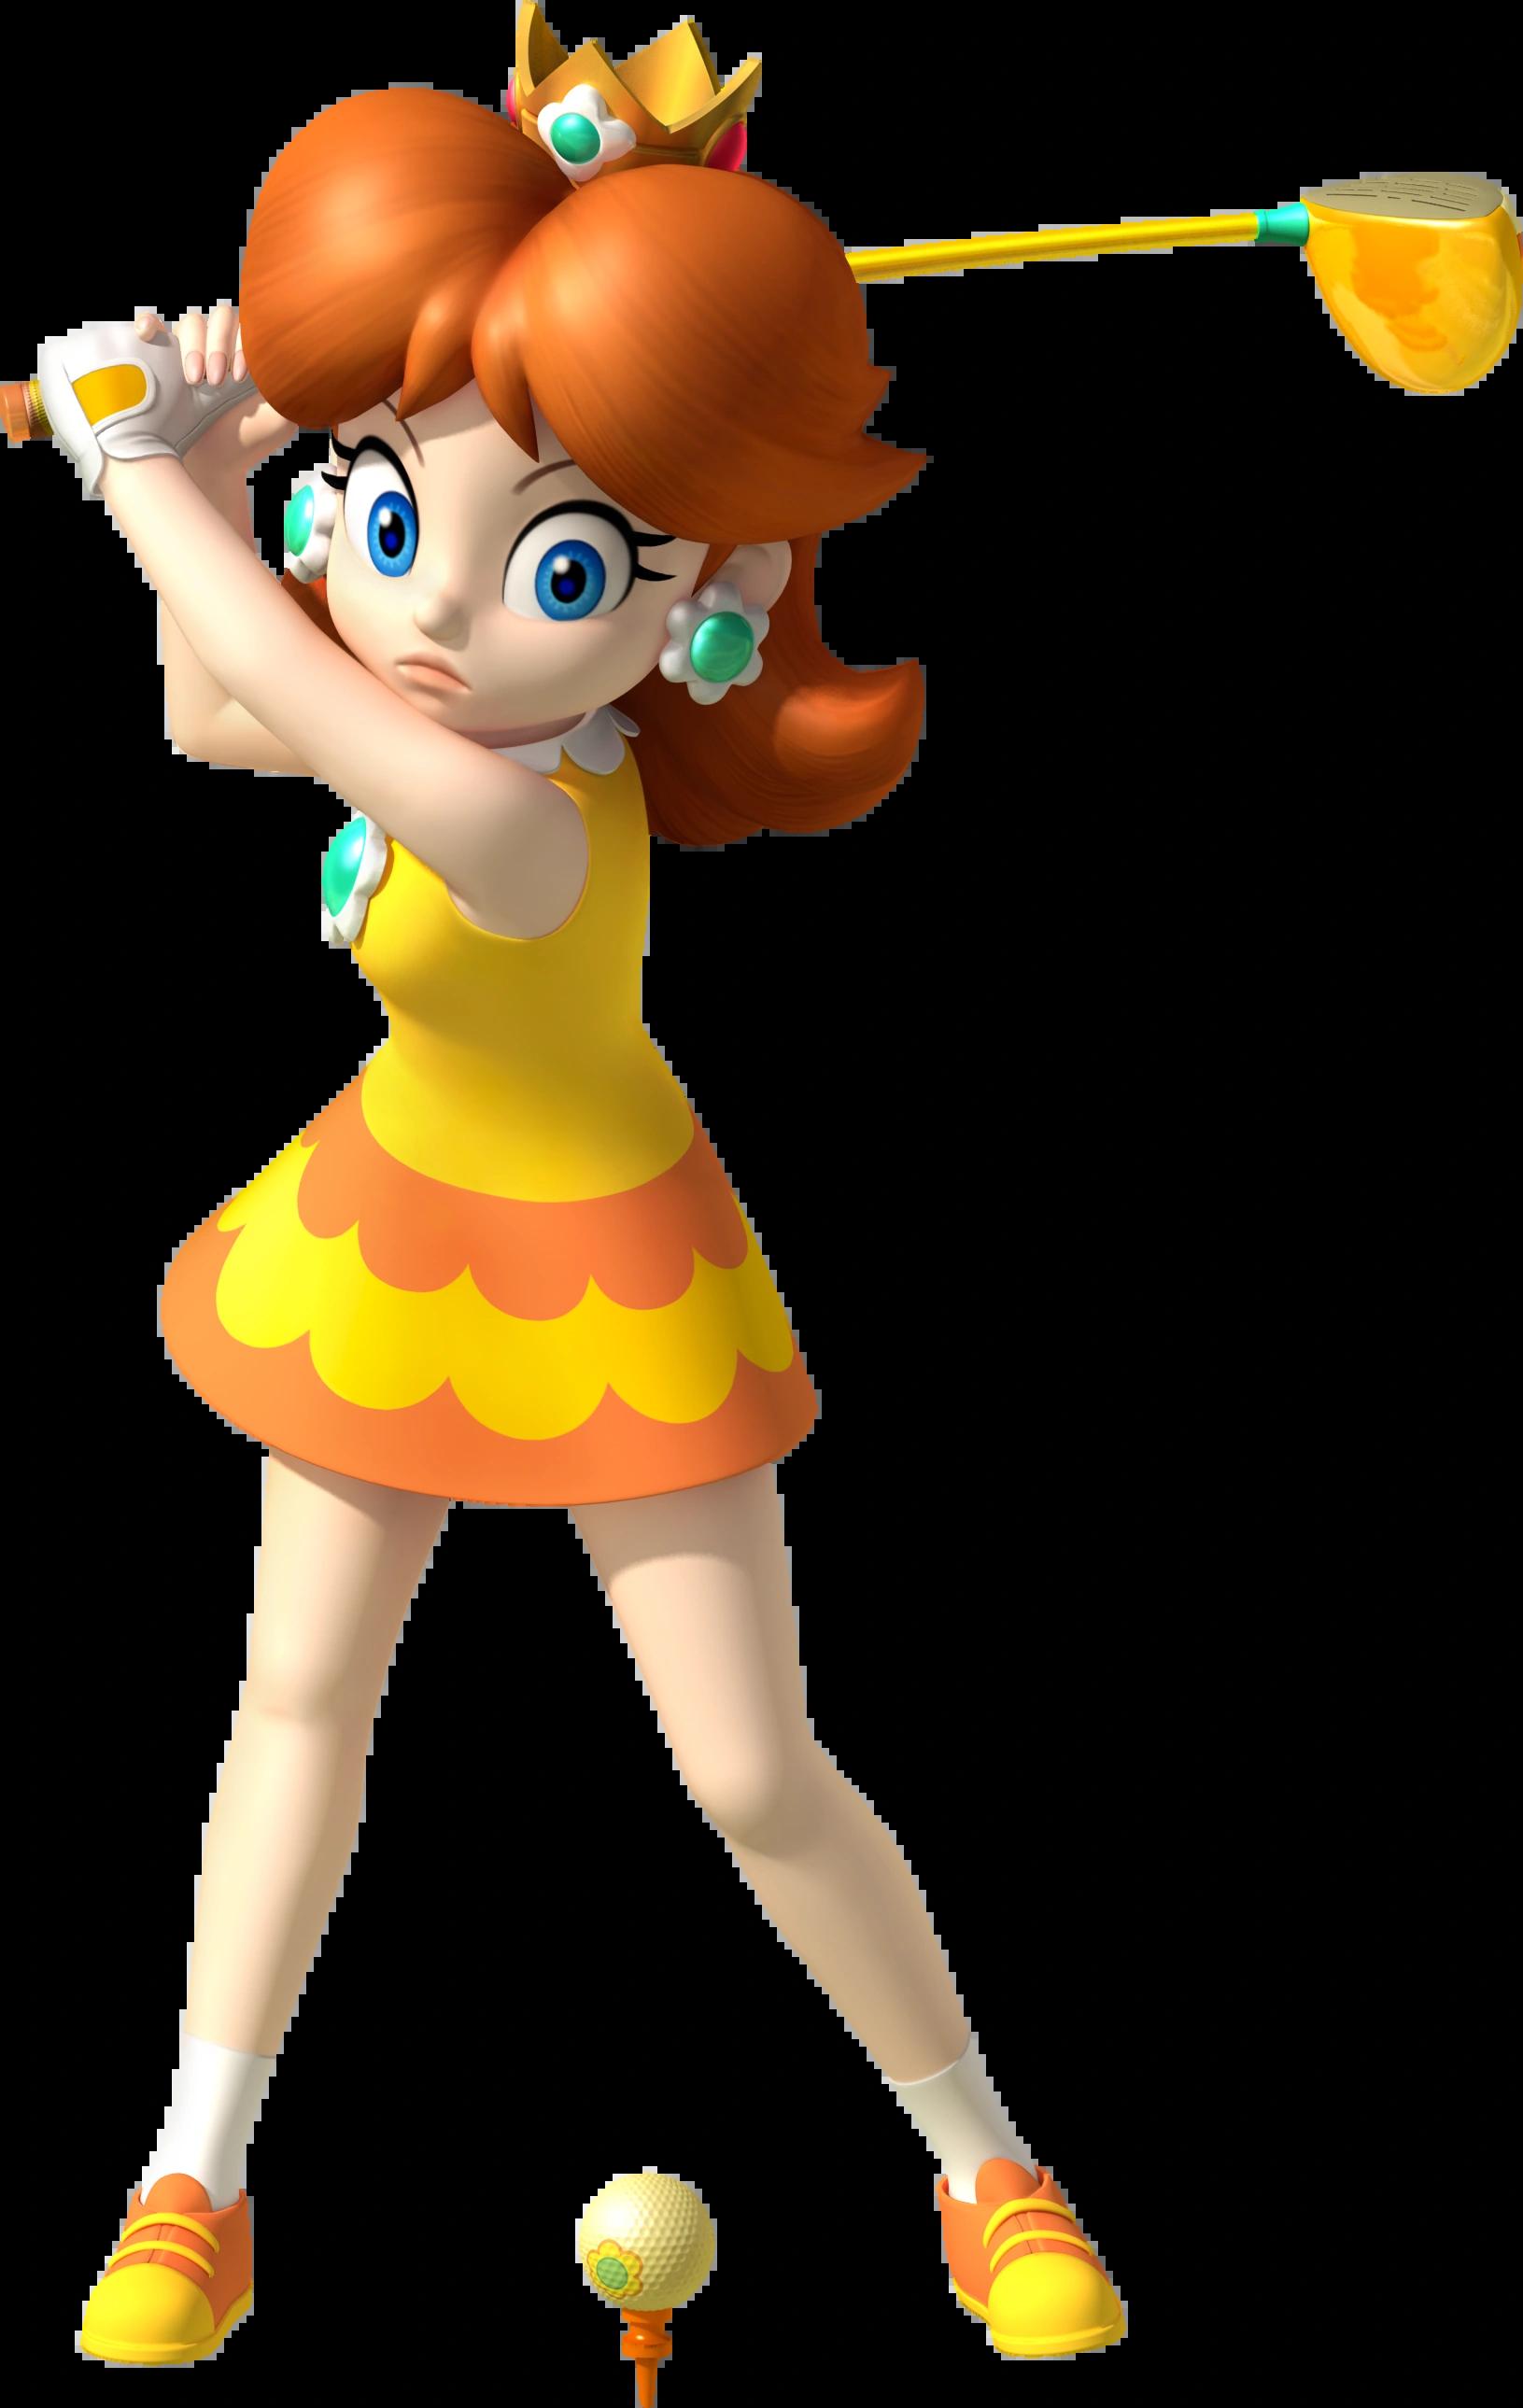 Mario Golf World Tour We Are Daisy Wikia FANDOM Powered By Wikia